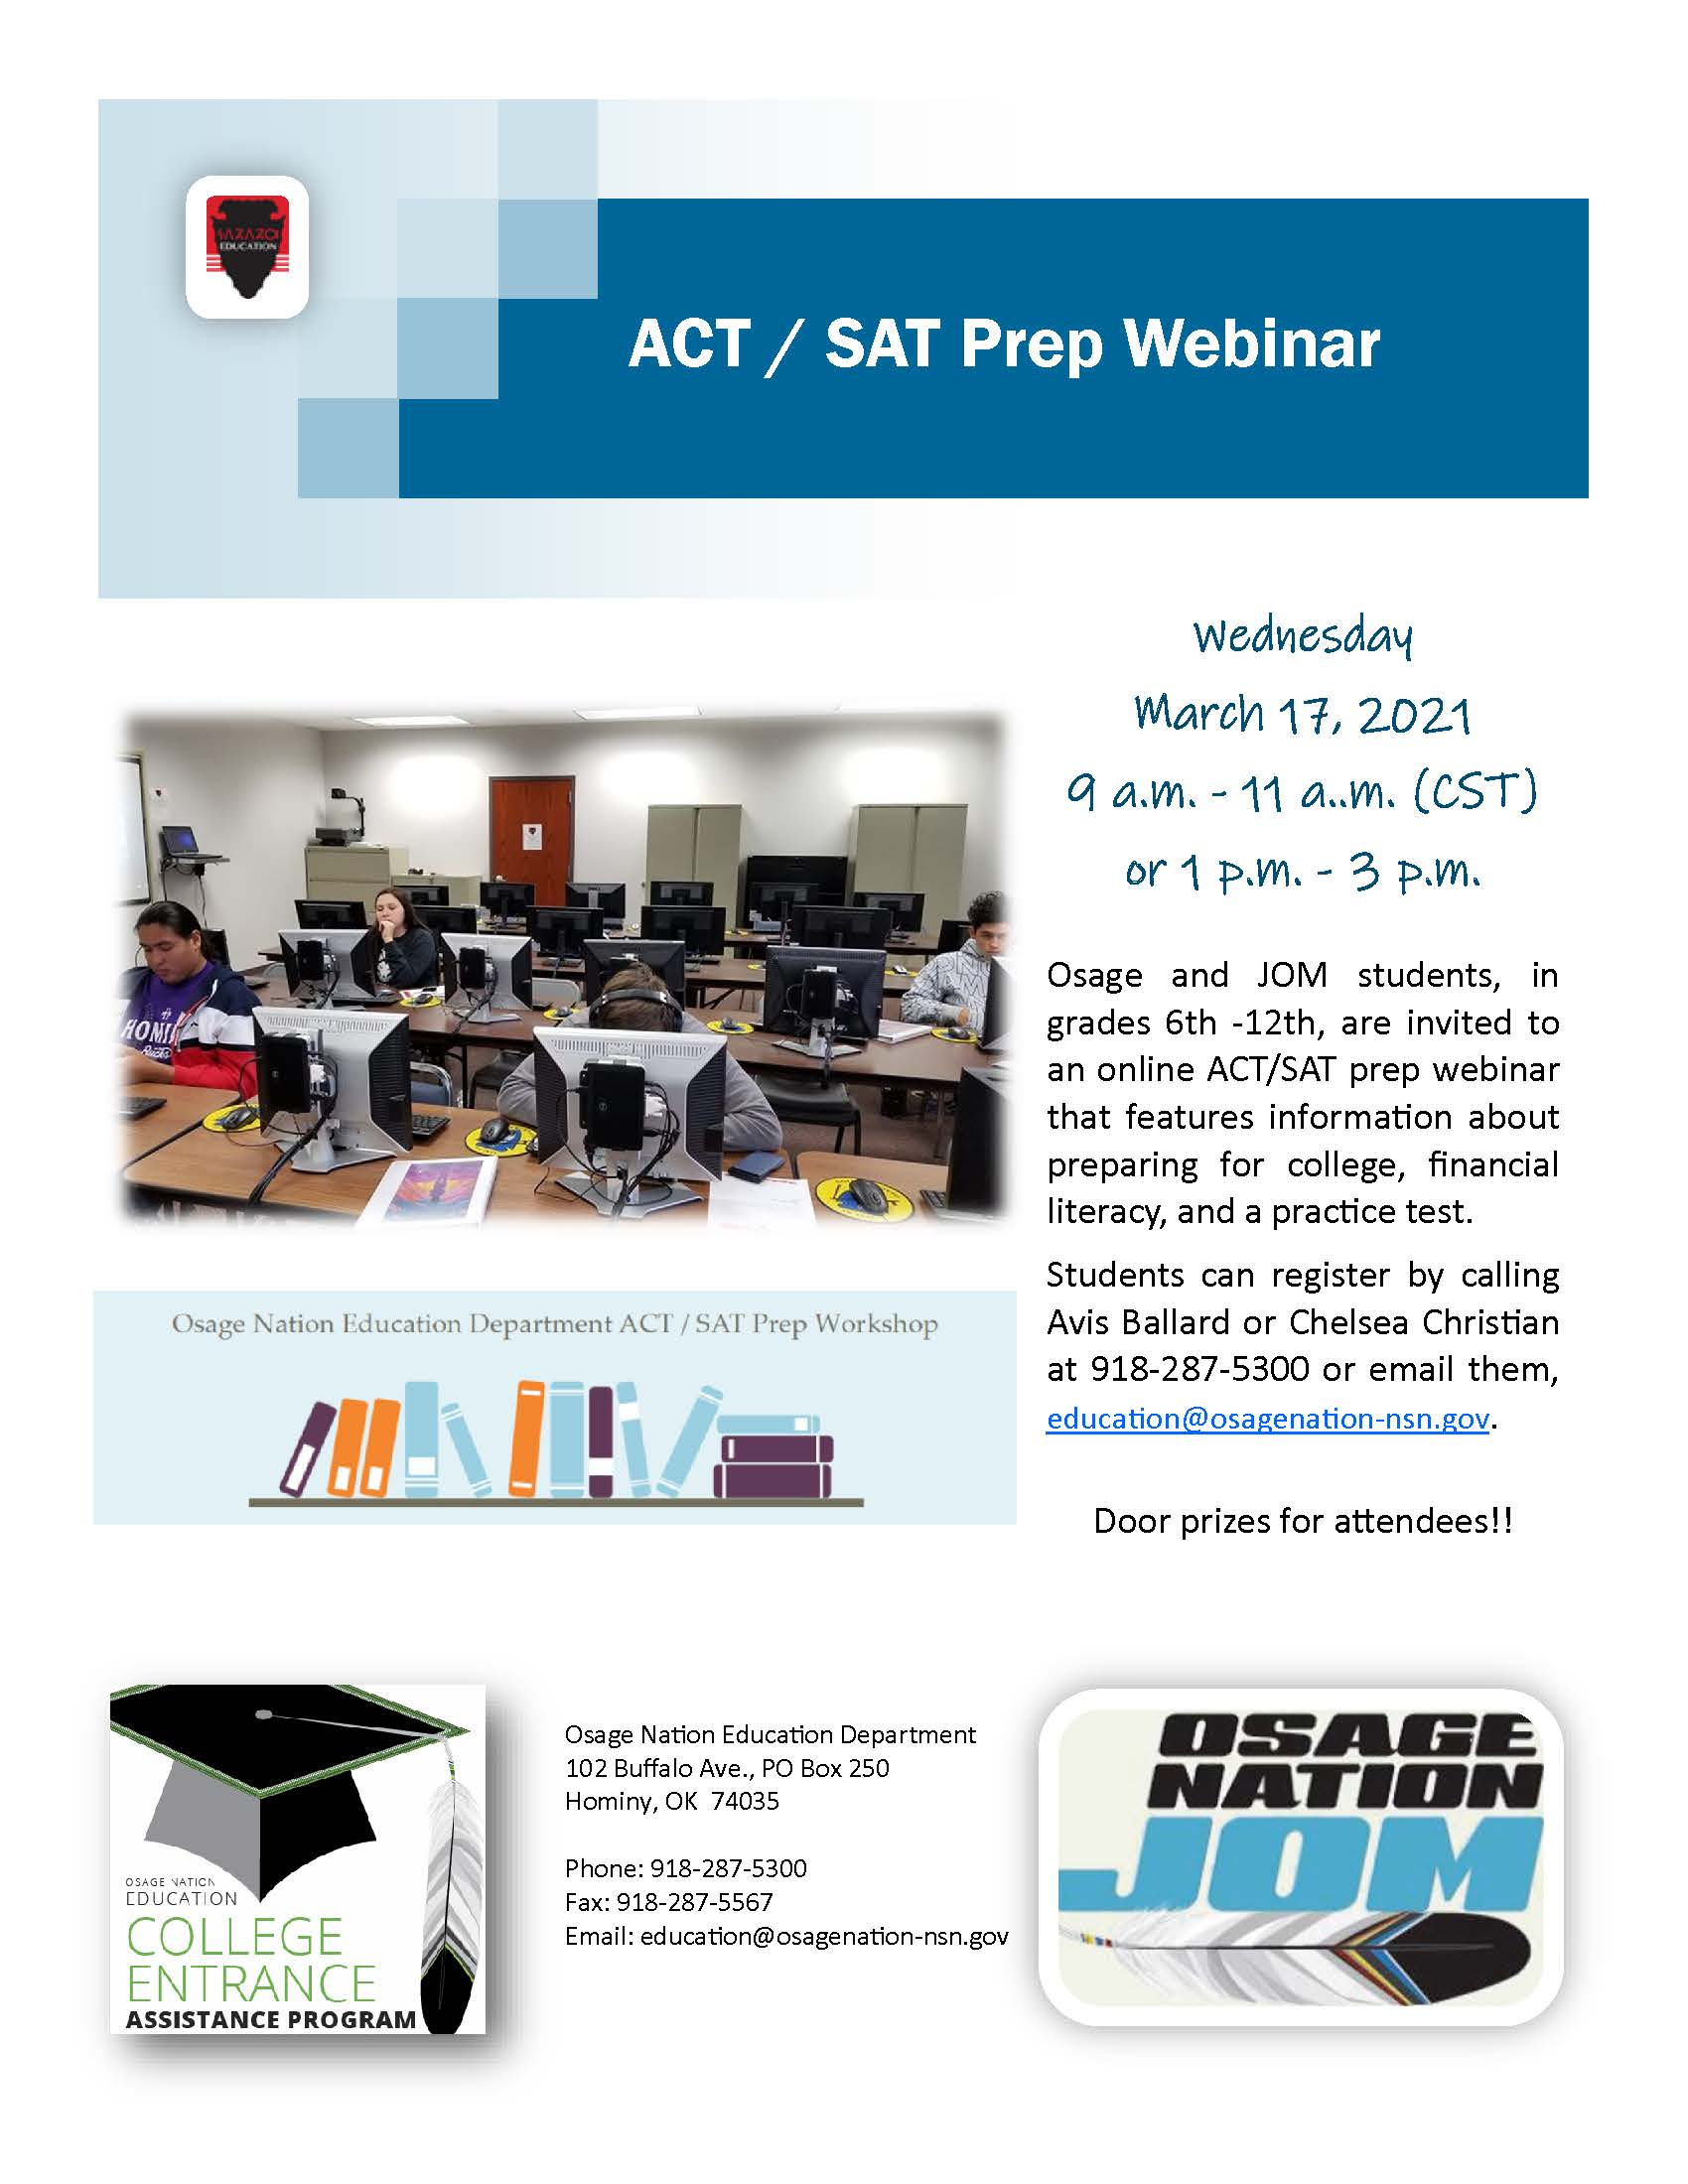 2021 ACT/SAT college prep webinar